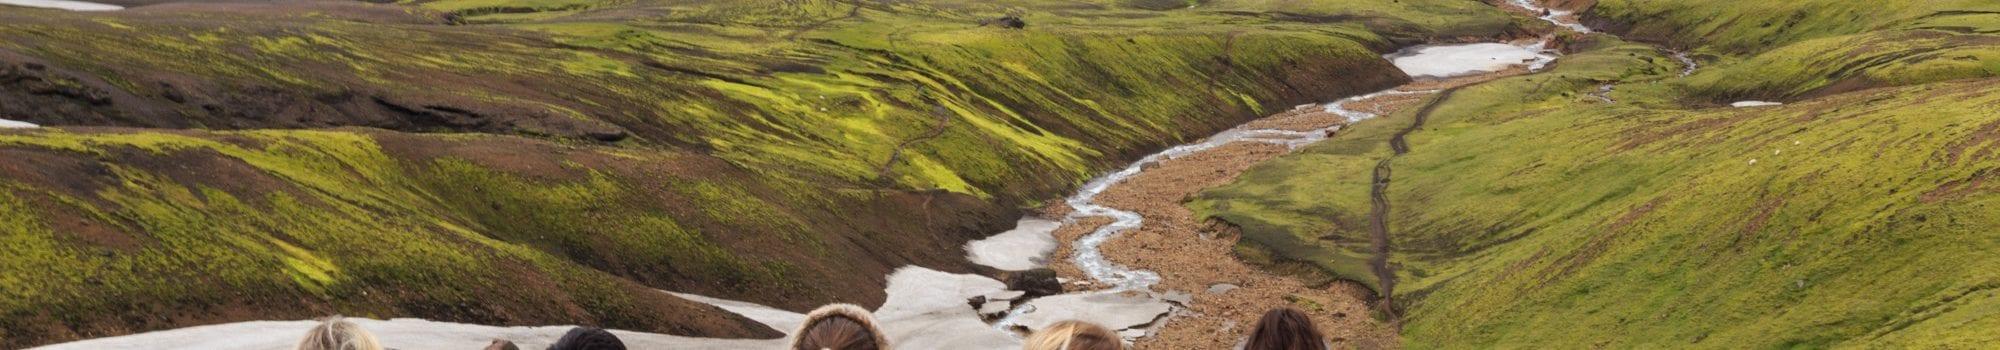 The view in Landmannalaugar